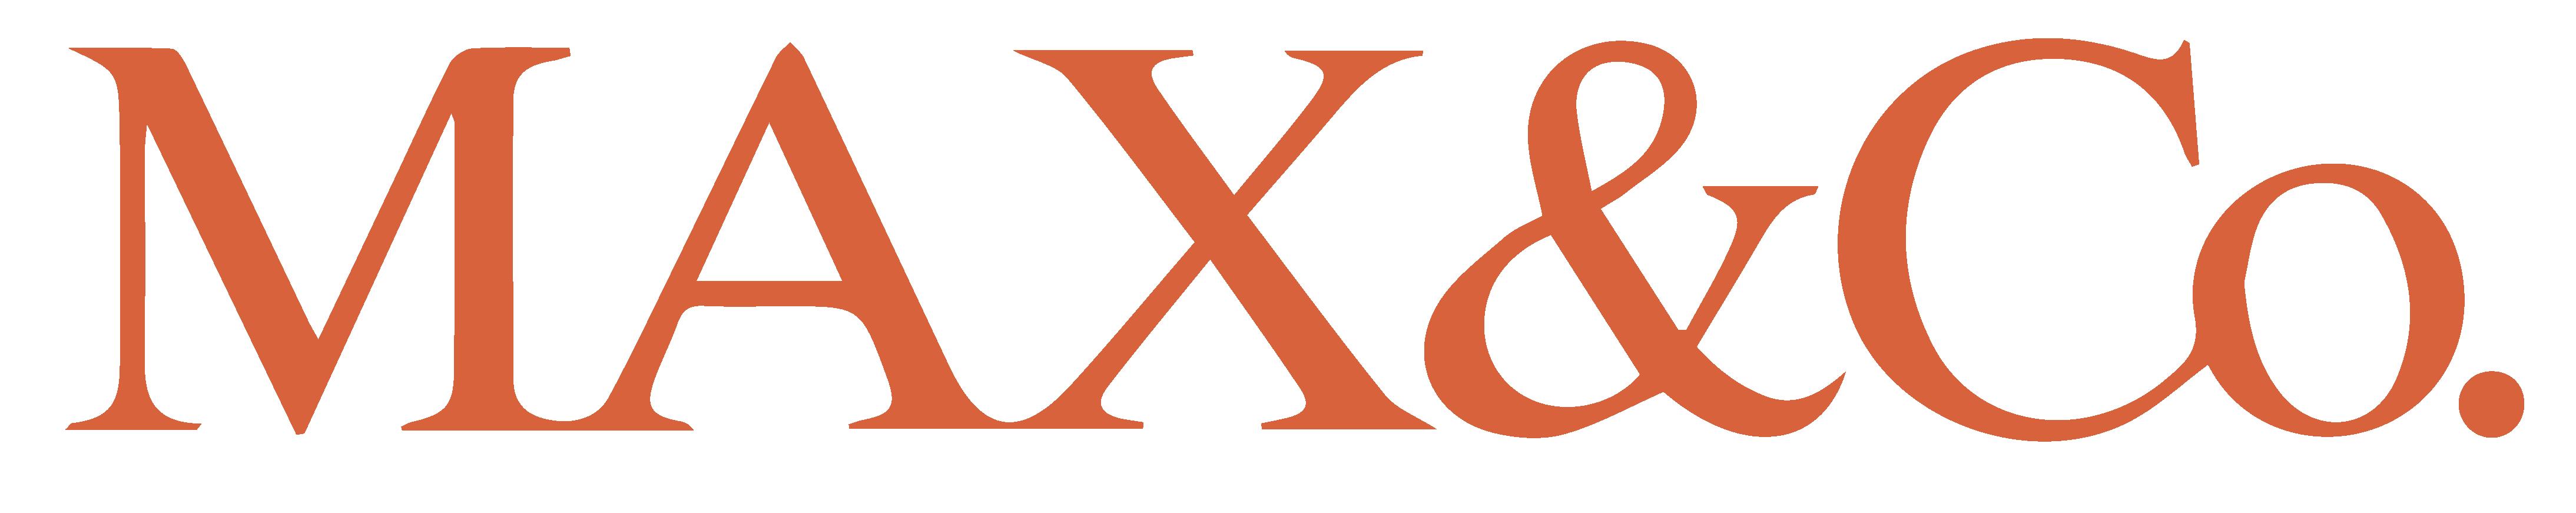 Customer Microlog Retail Max&Co